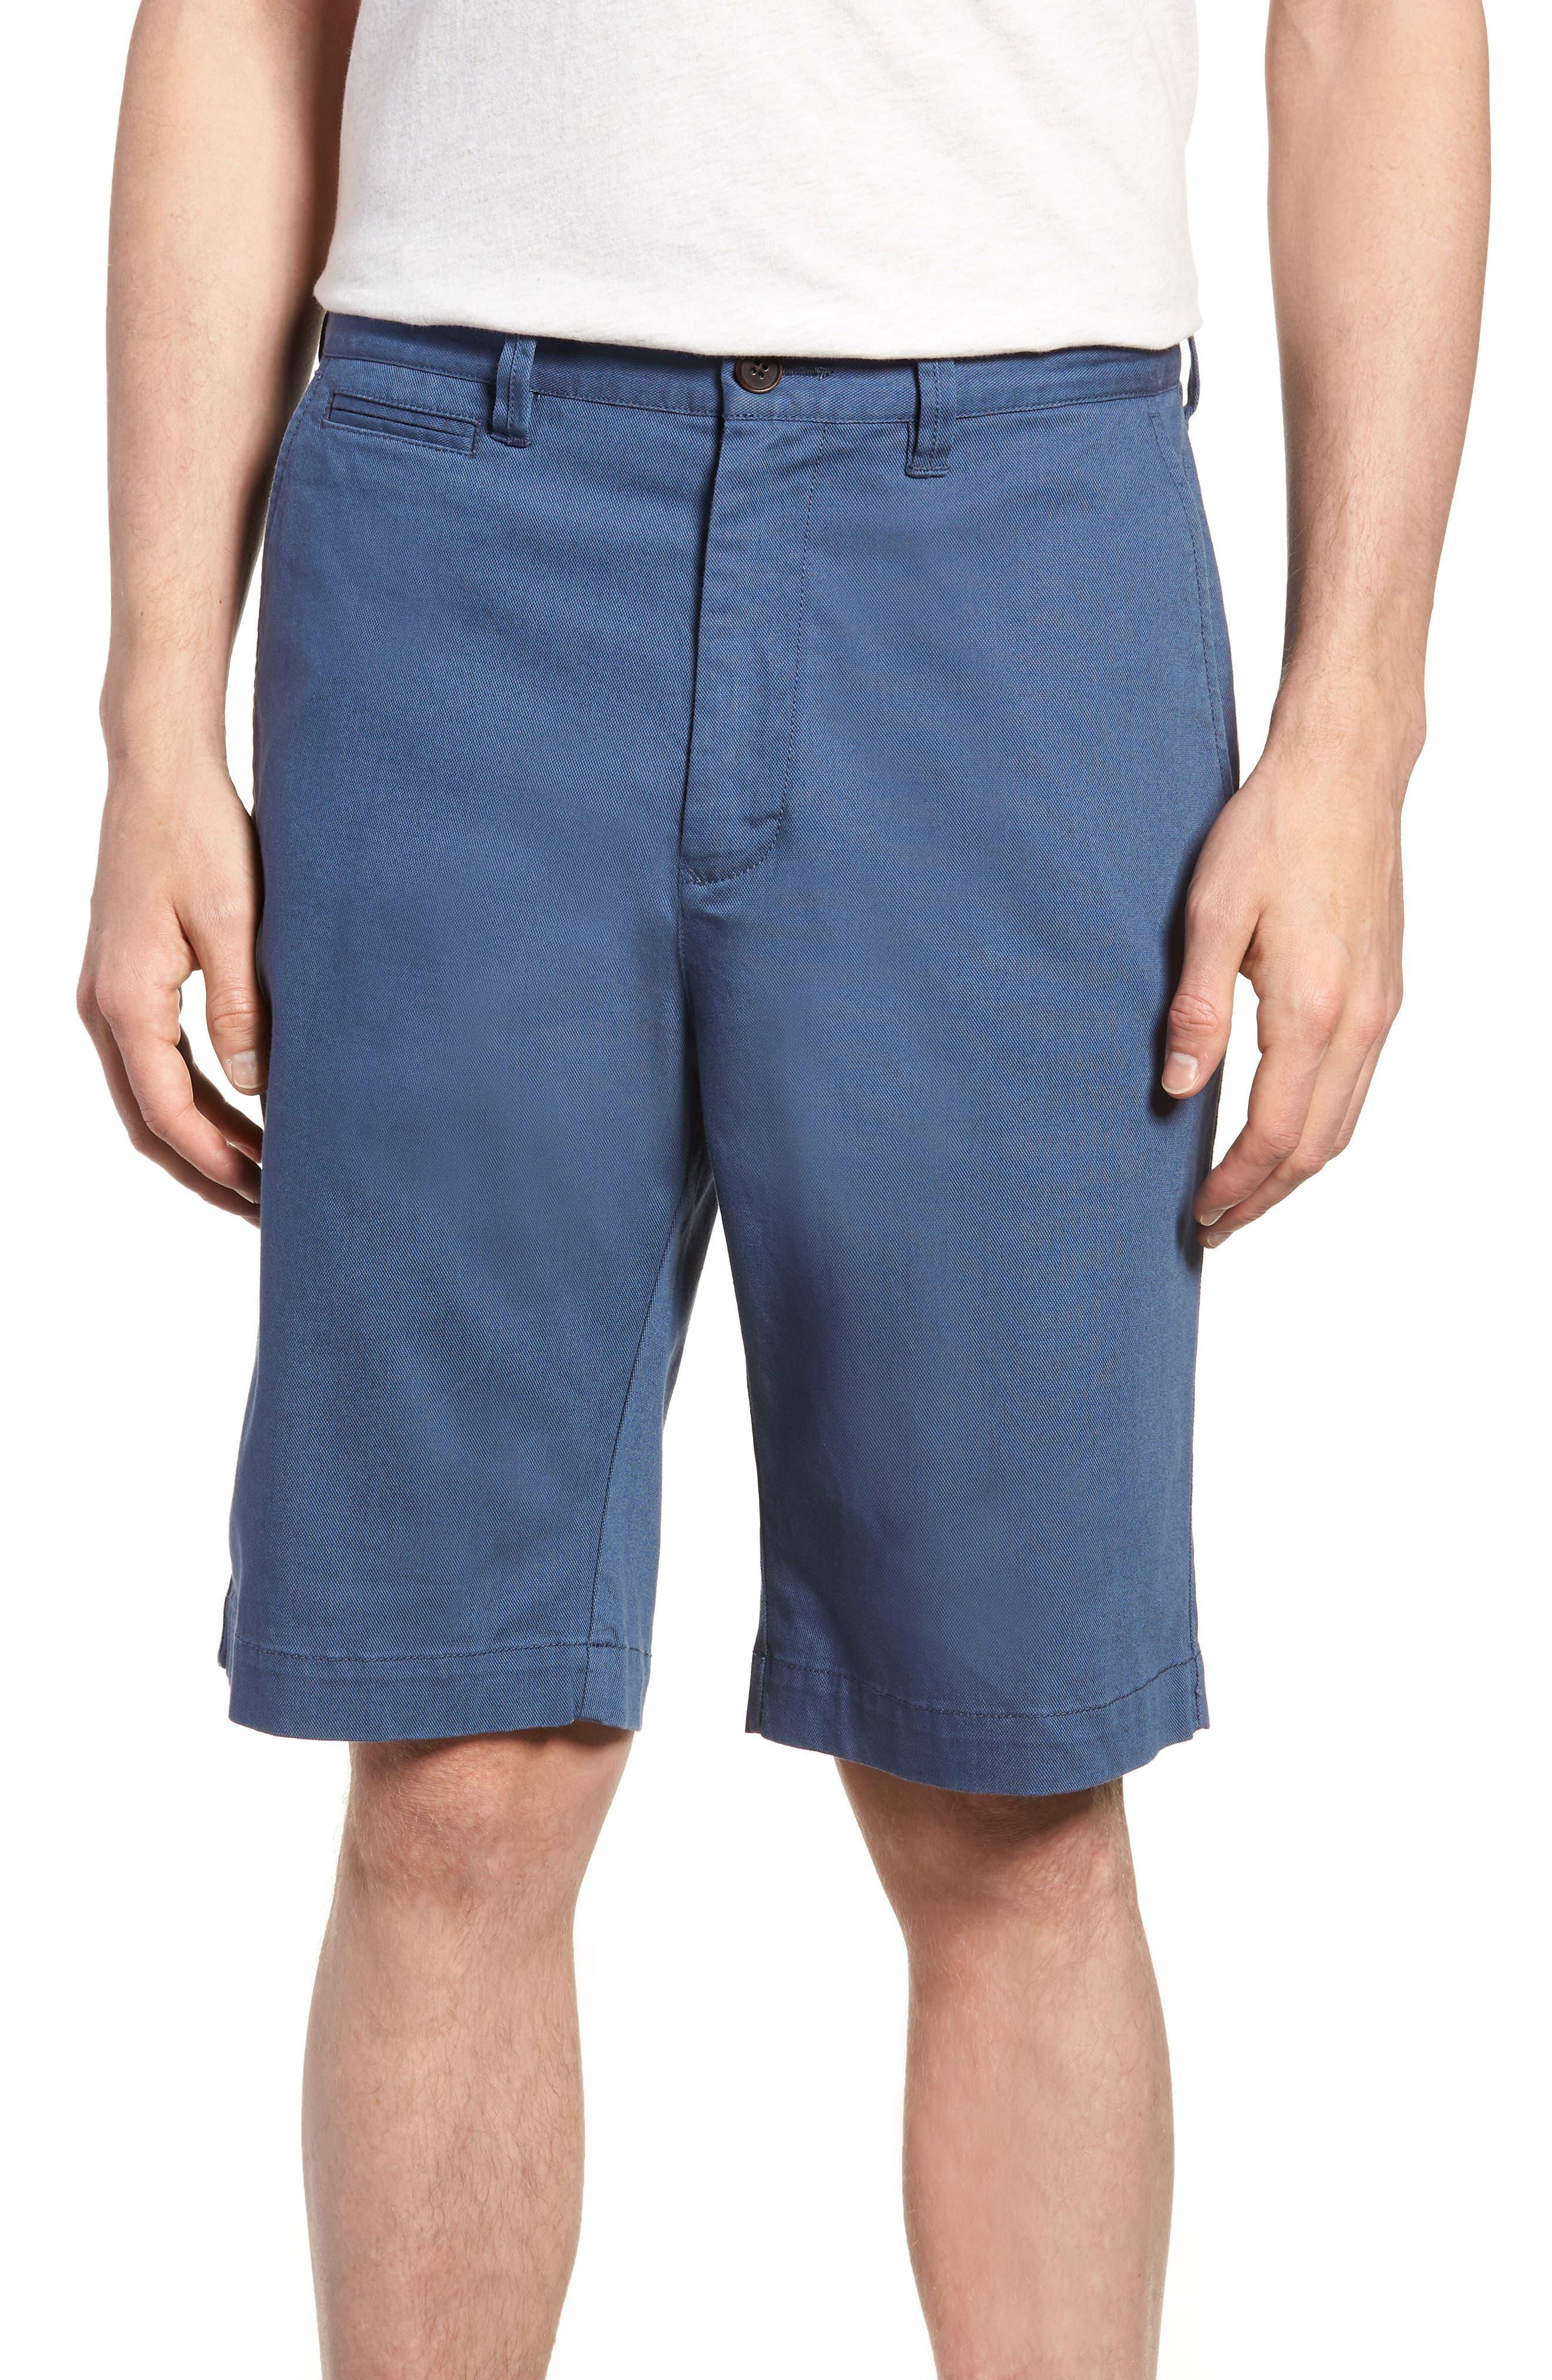 Driving Creek Regular Fit Flat Front Shorts,                             Main thumbnail 1, color,                             020